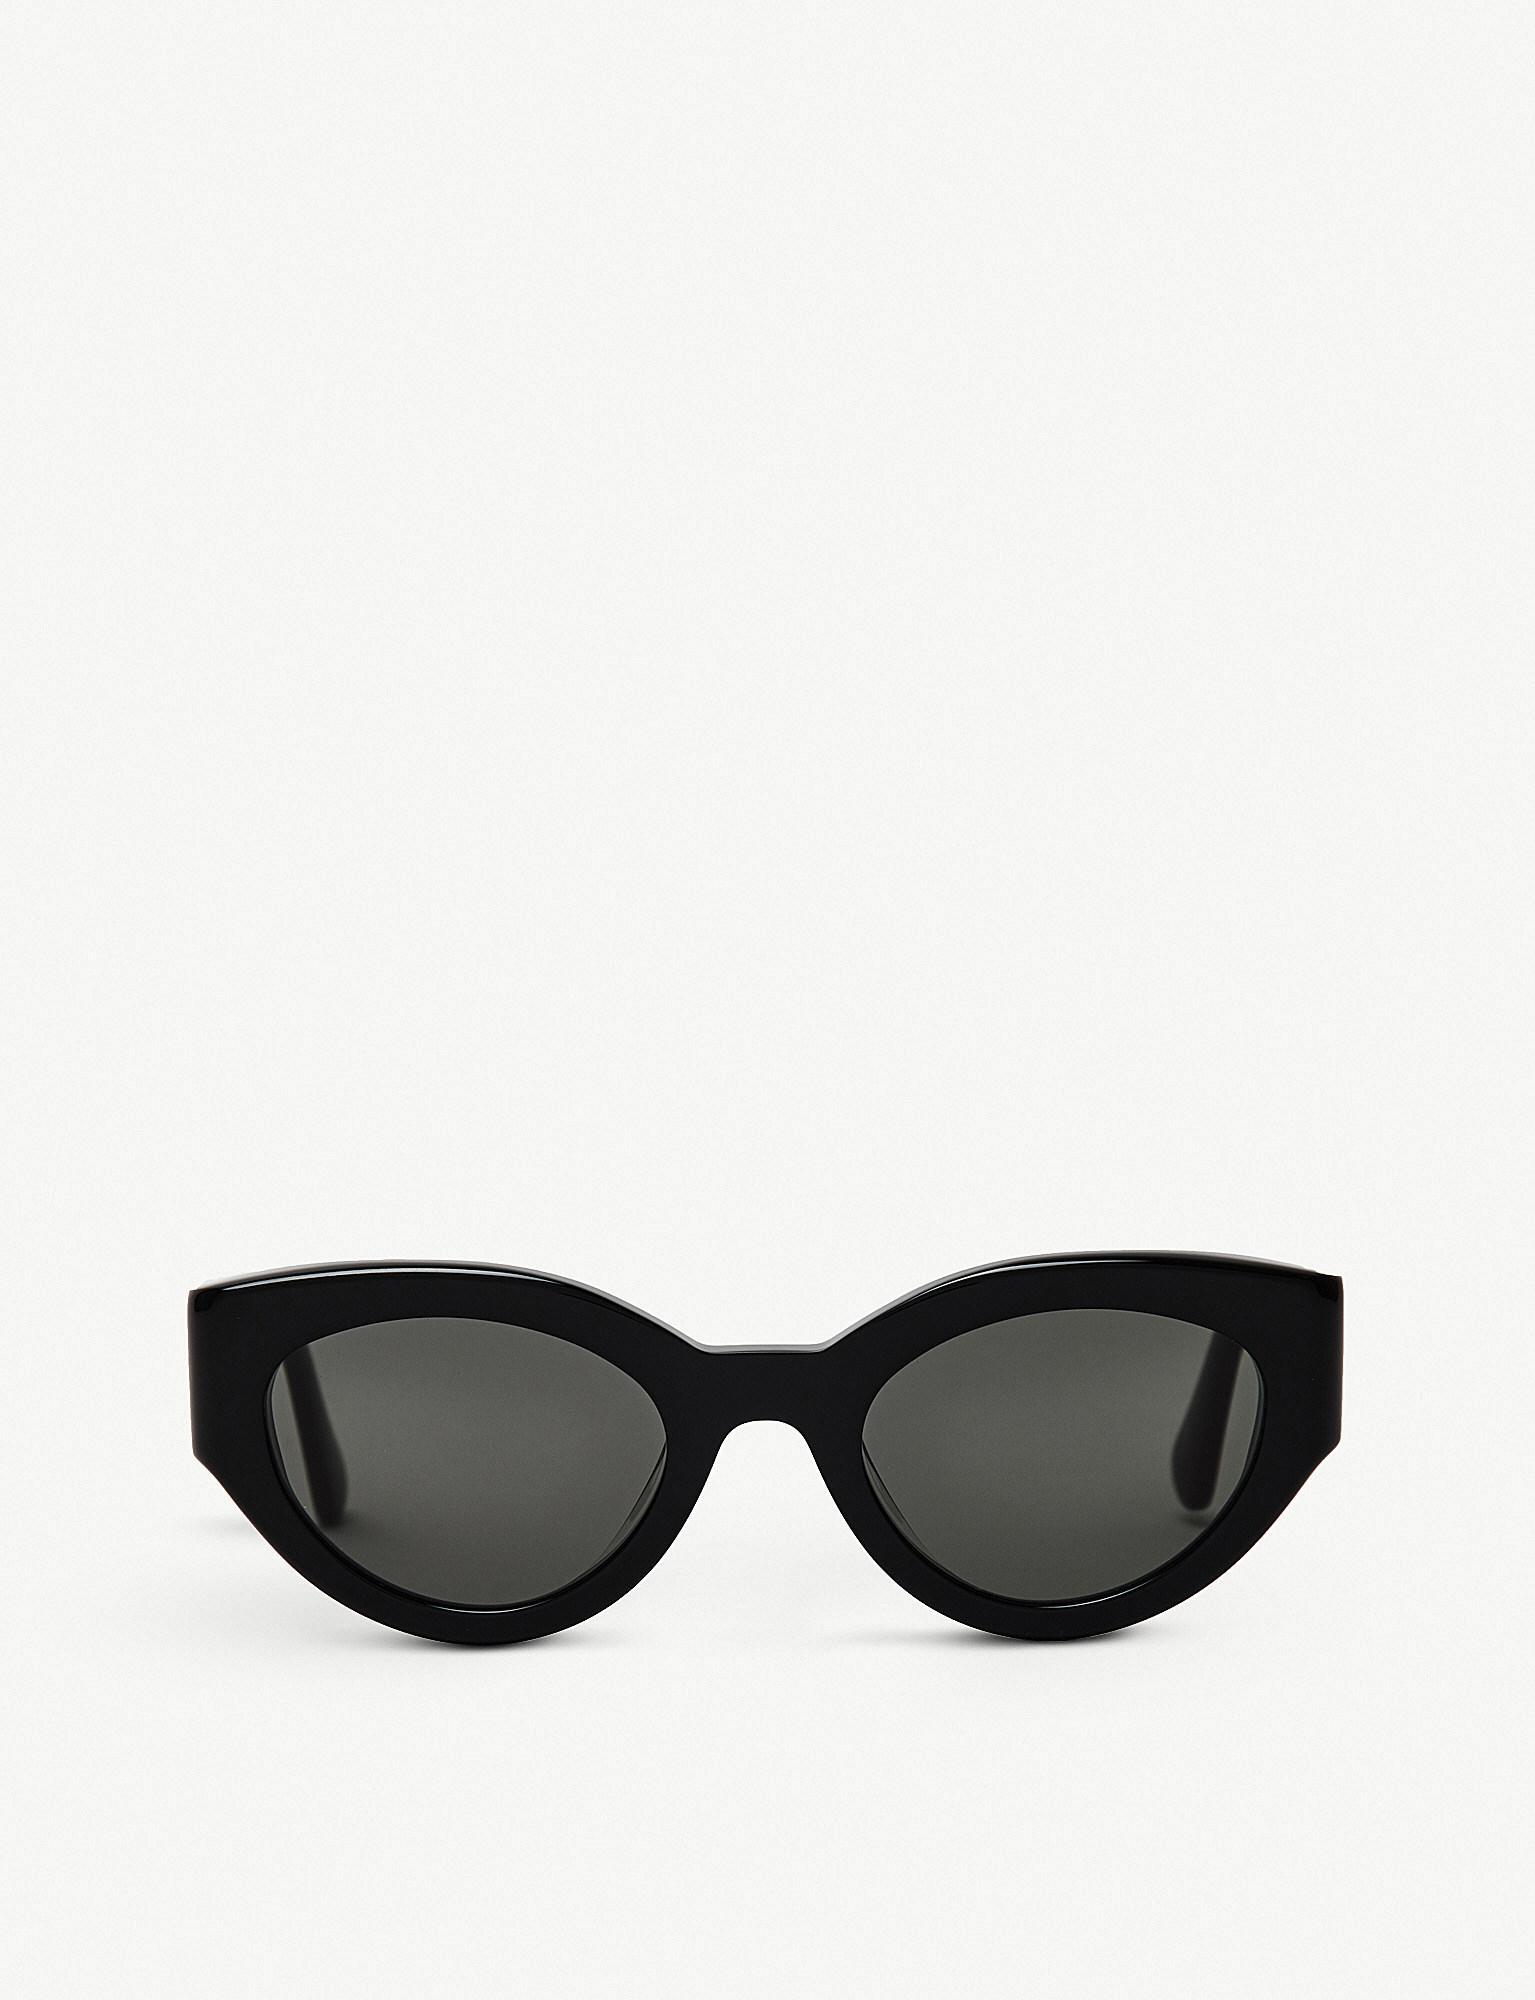 8e8f1e1ee3c Lyst - Gentle Monster Ladies Black Tazi Acetate Sunglasses in Black